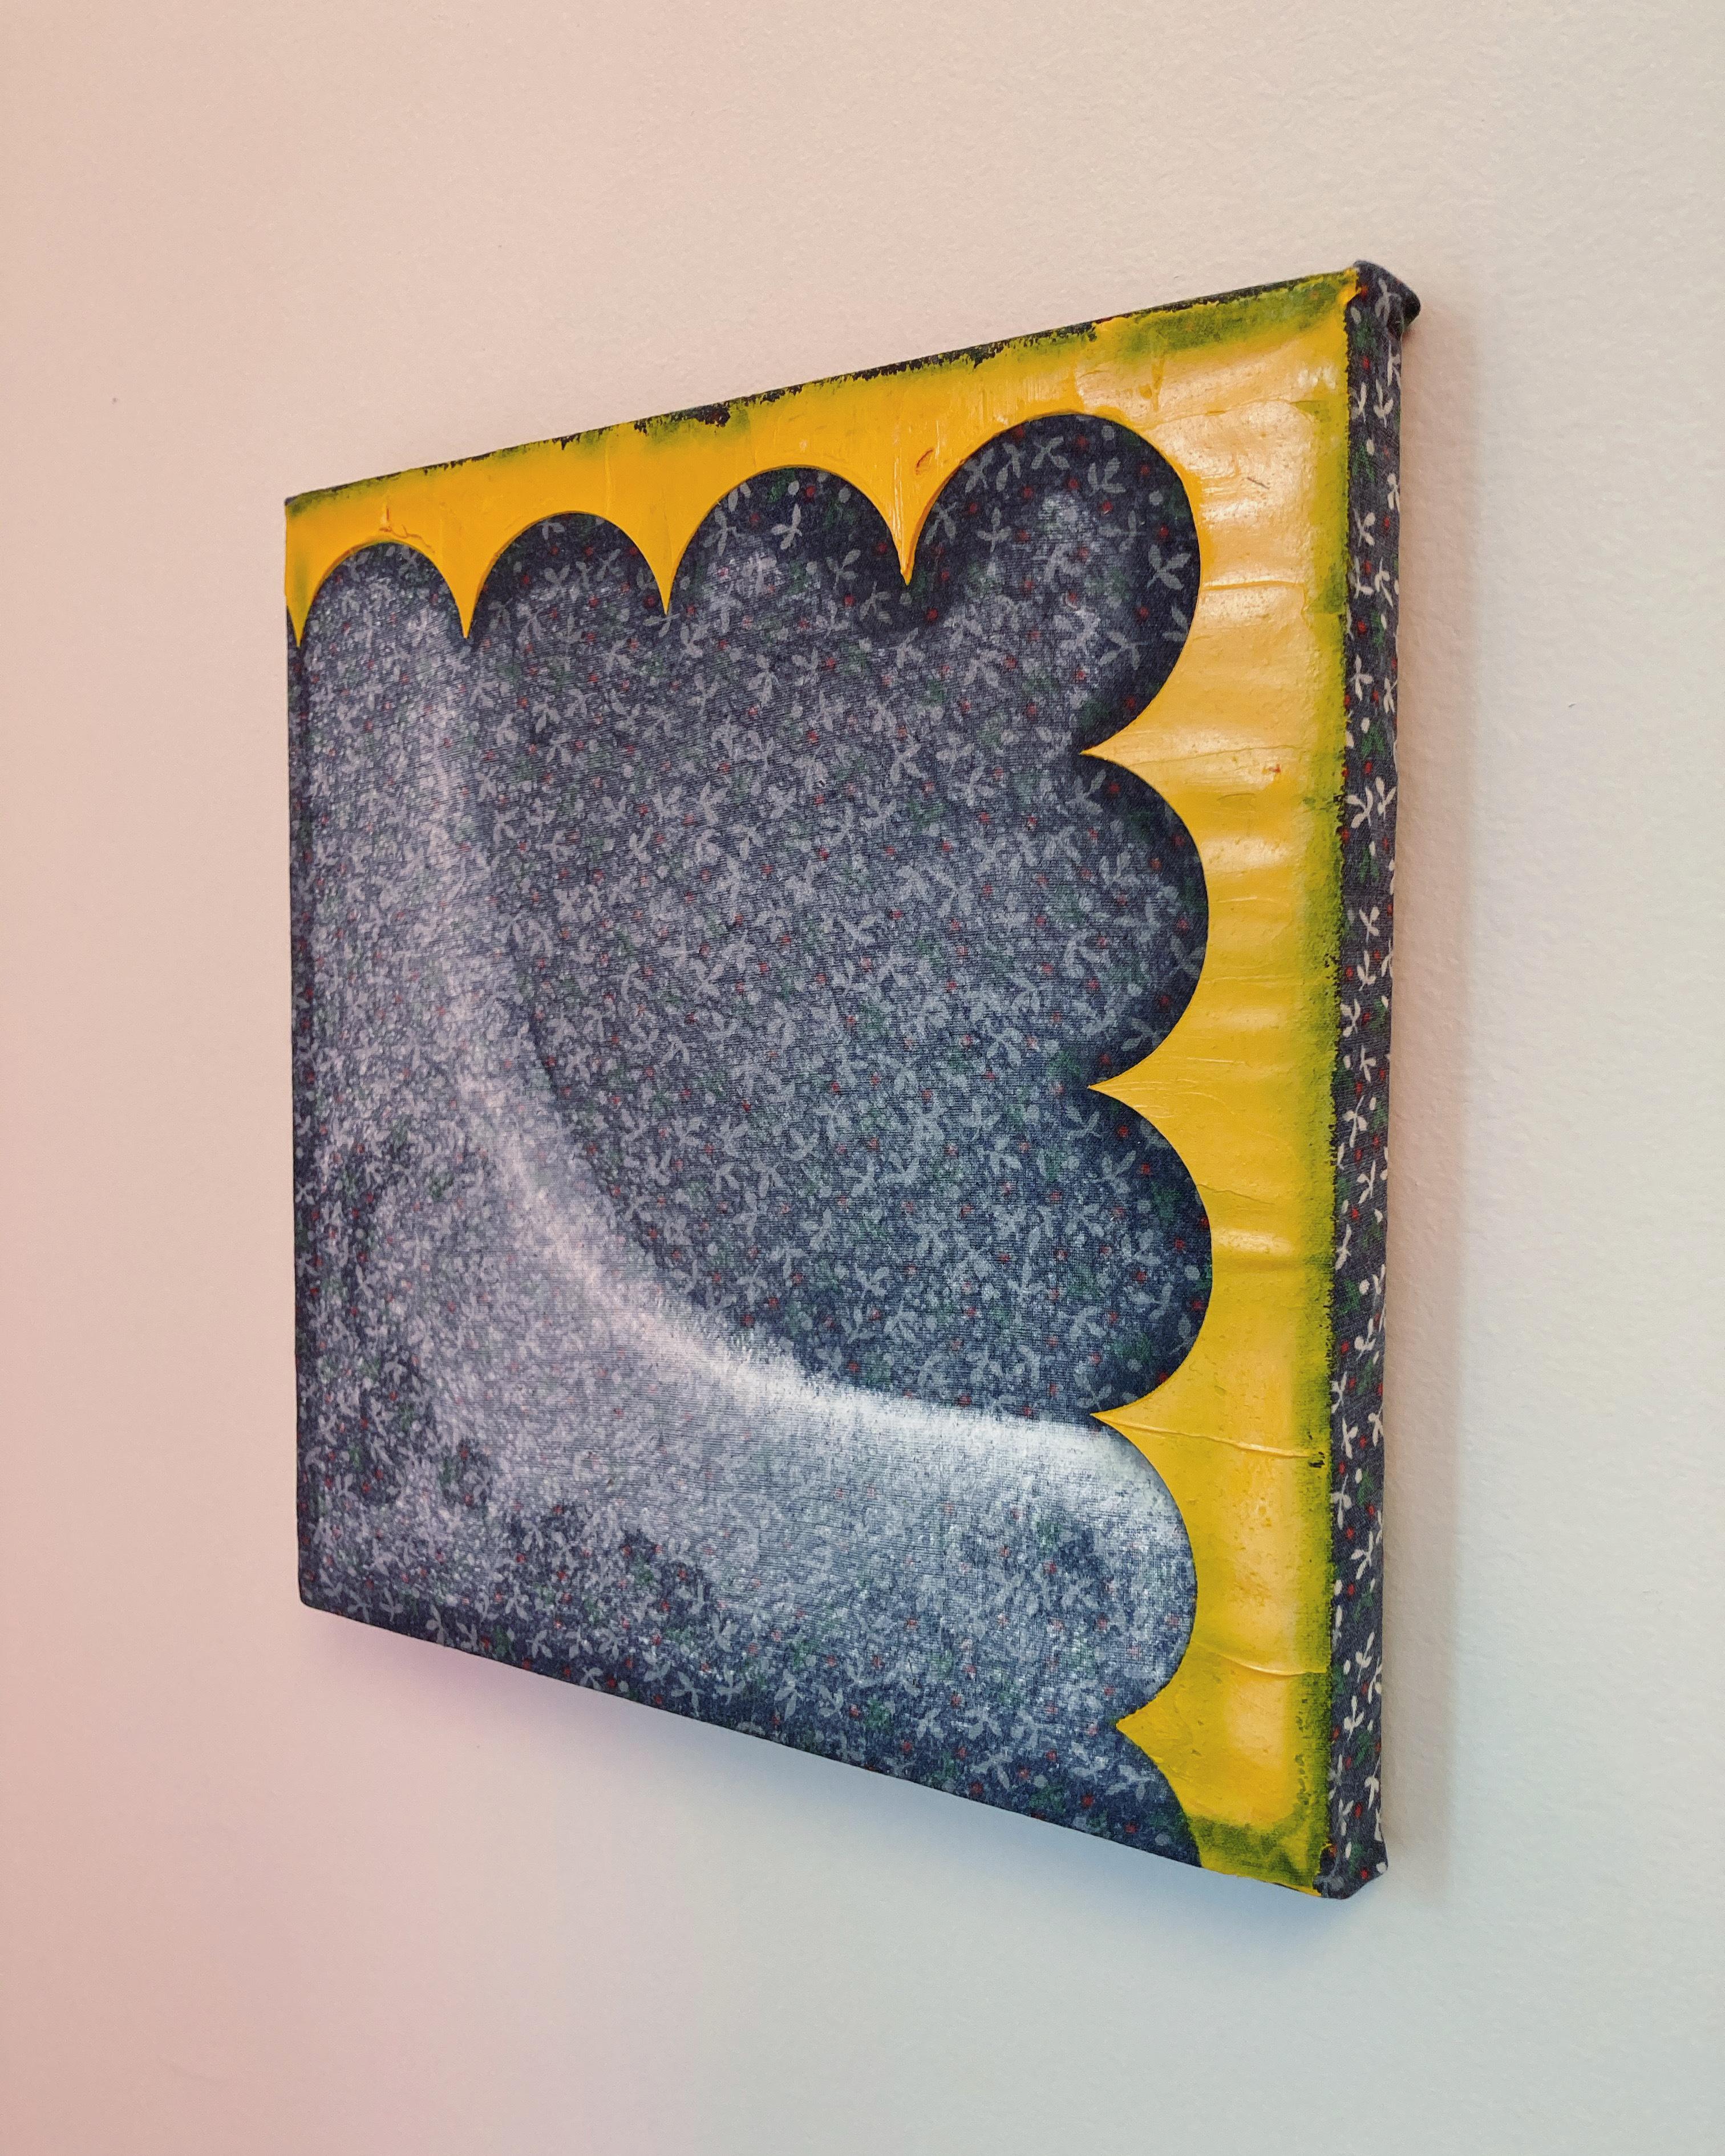 Gallery Visit, ZieherSmith, Nashville, TN (feat. Jodi Hays)